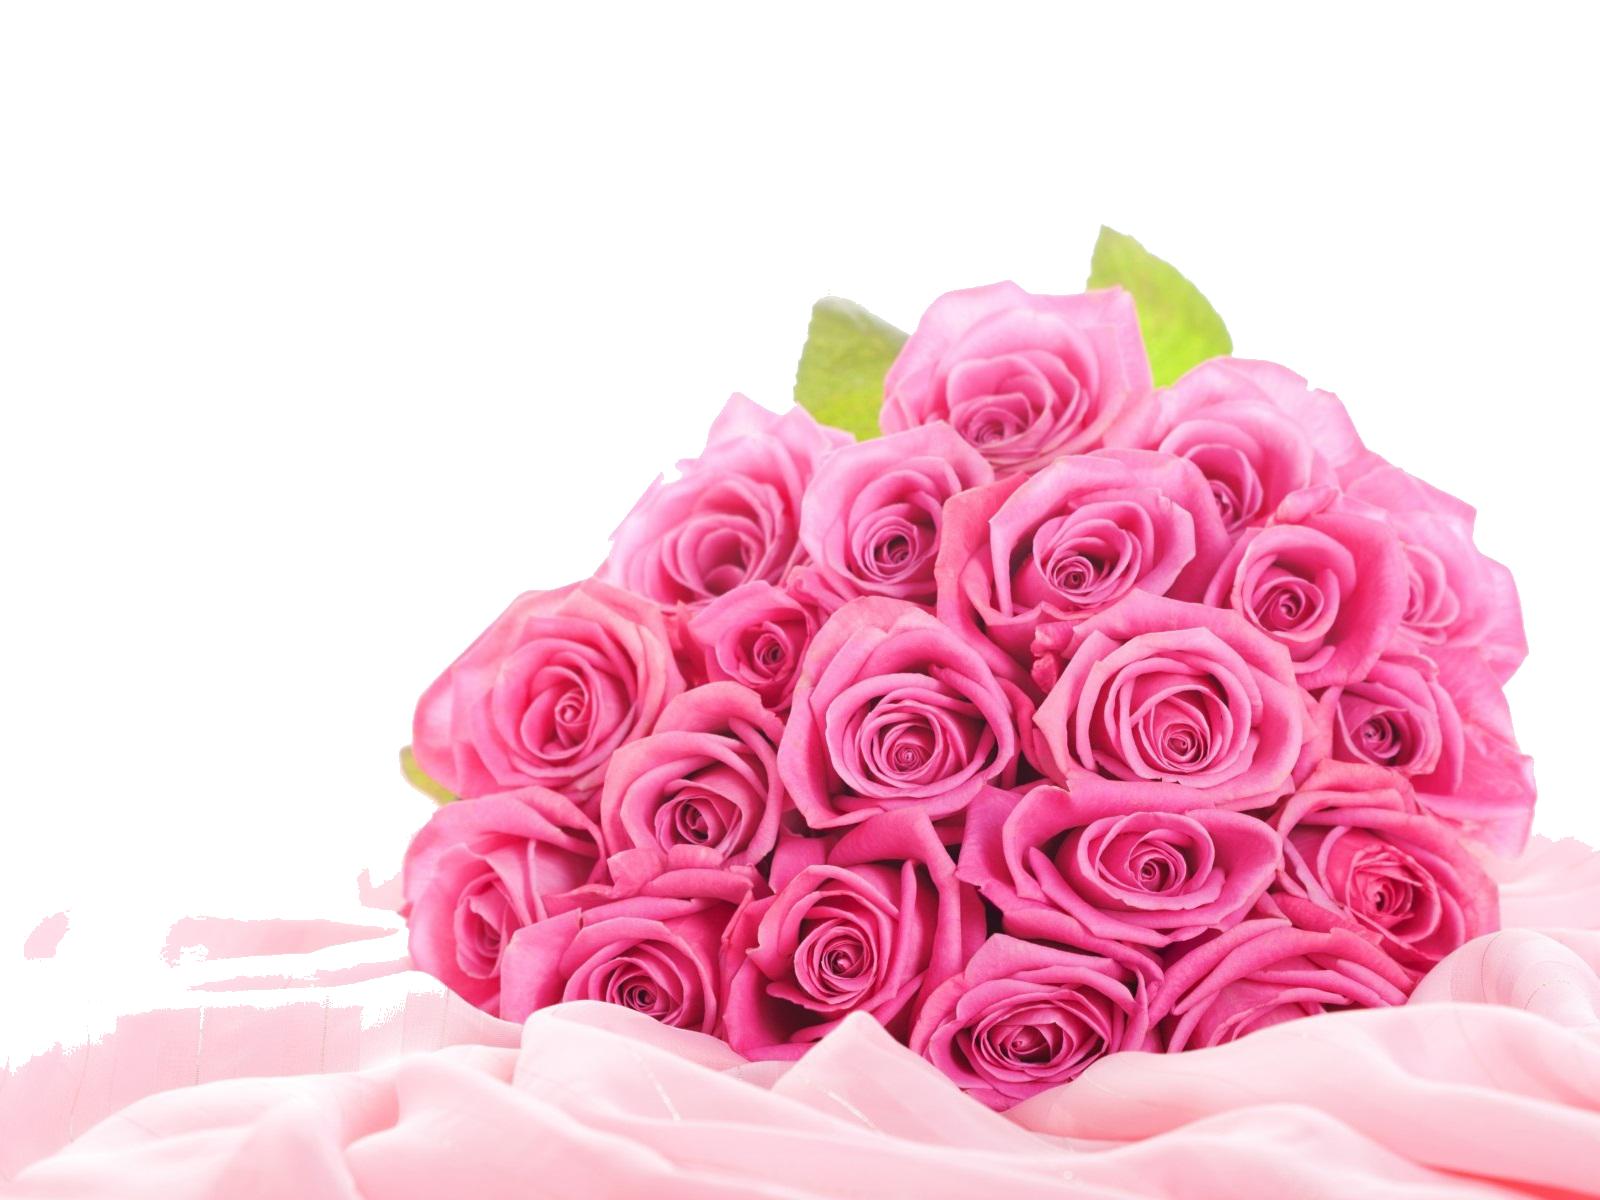 Pink Rose clipart flower bouquet Bouquet Flowers PNG Roses Flowers